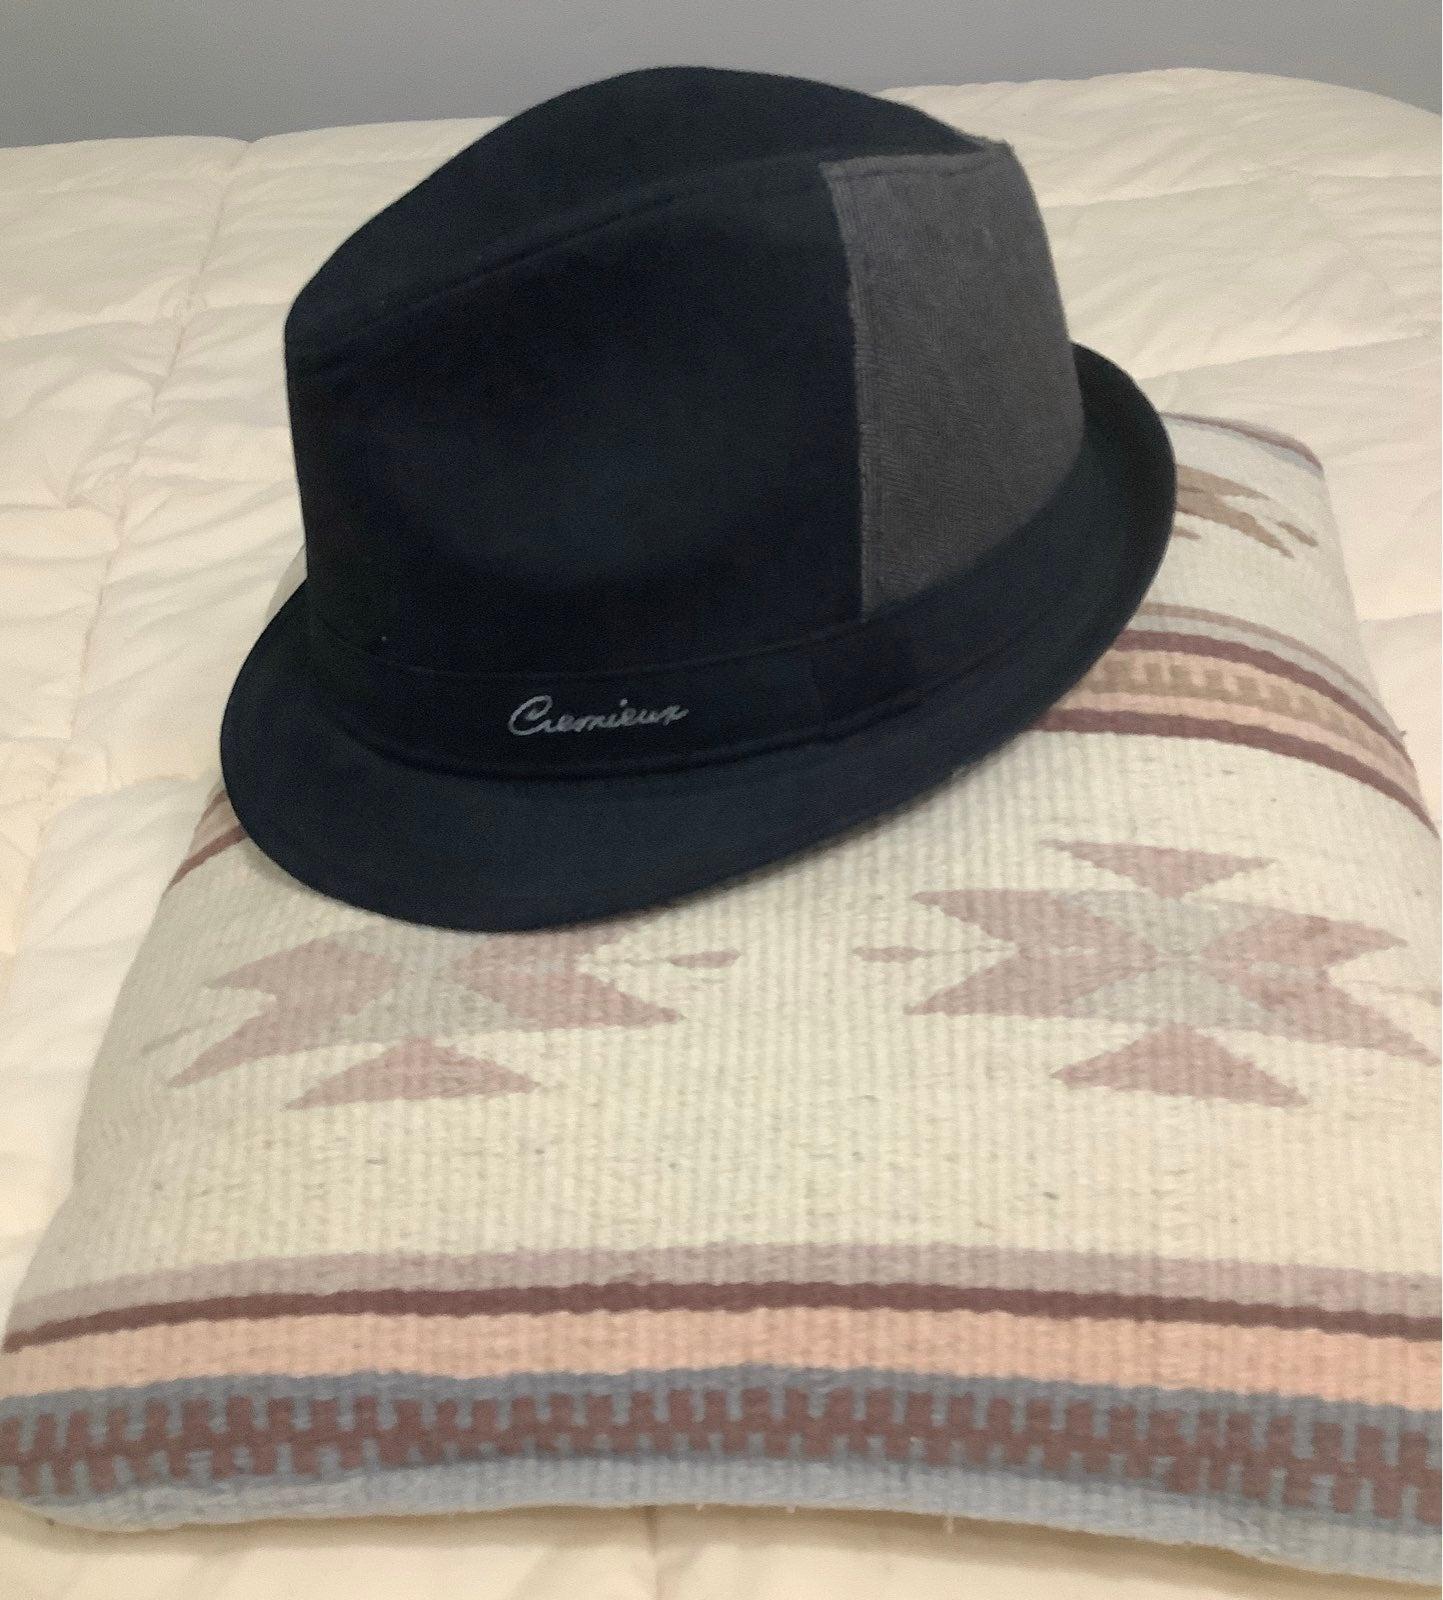 Daniel Cremieux Fendora Hat